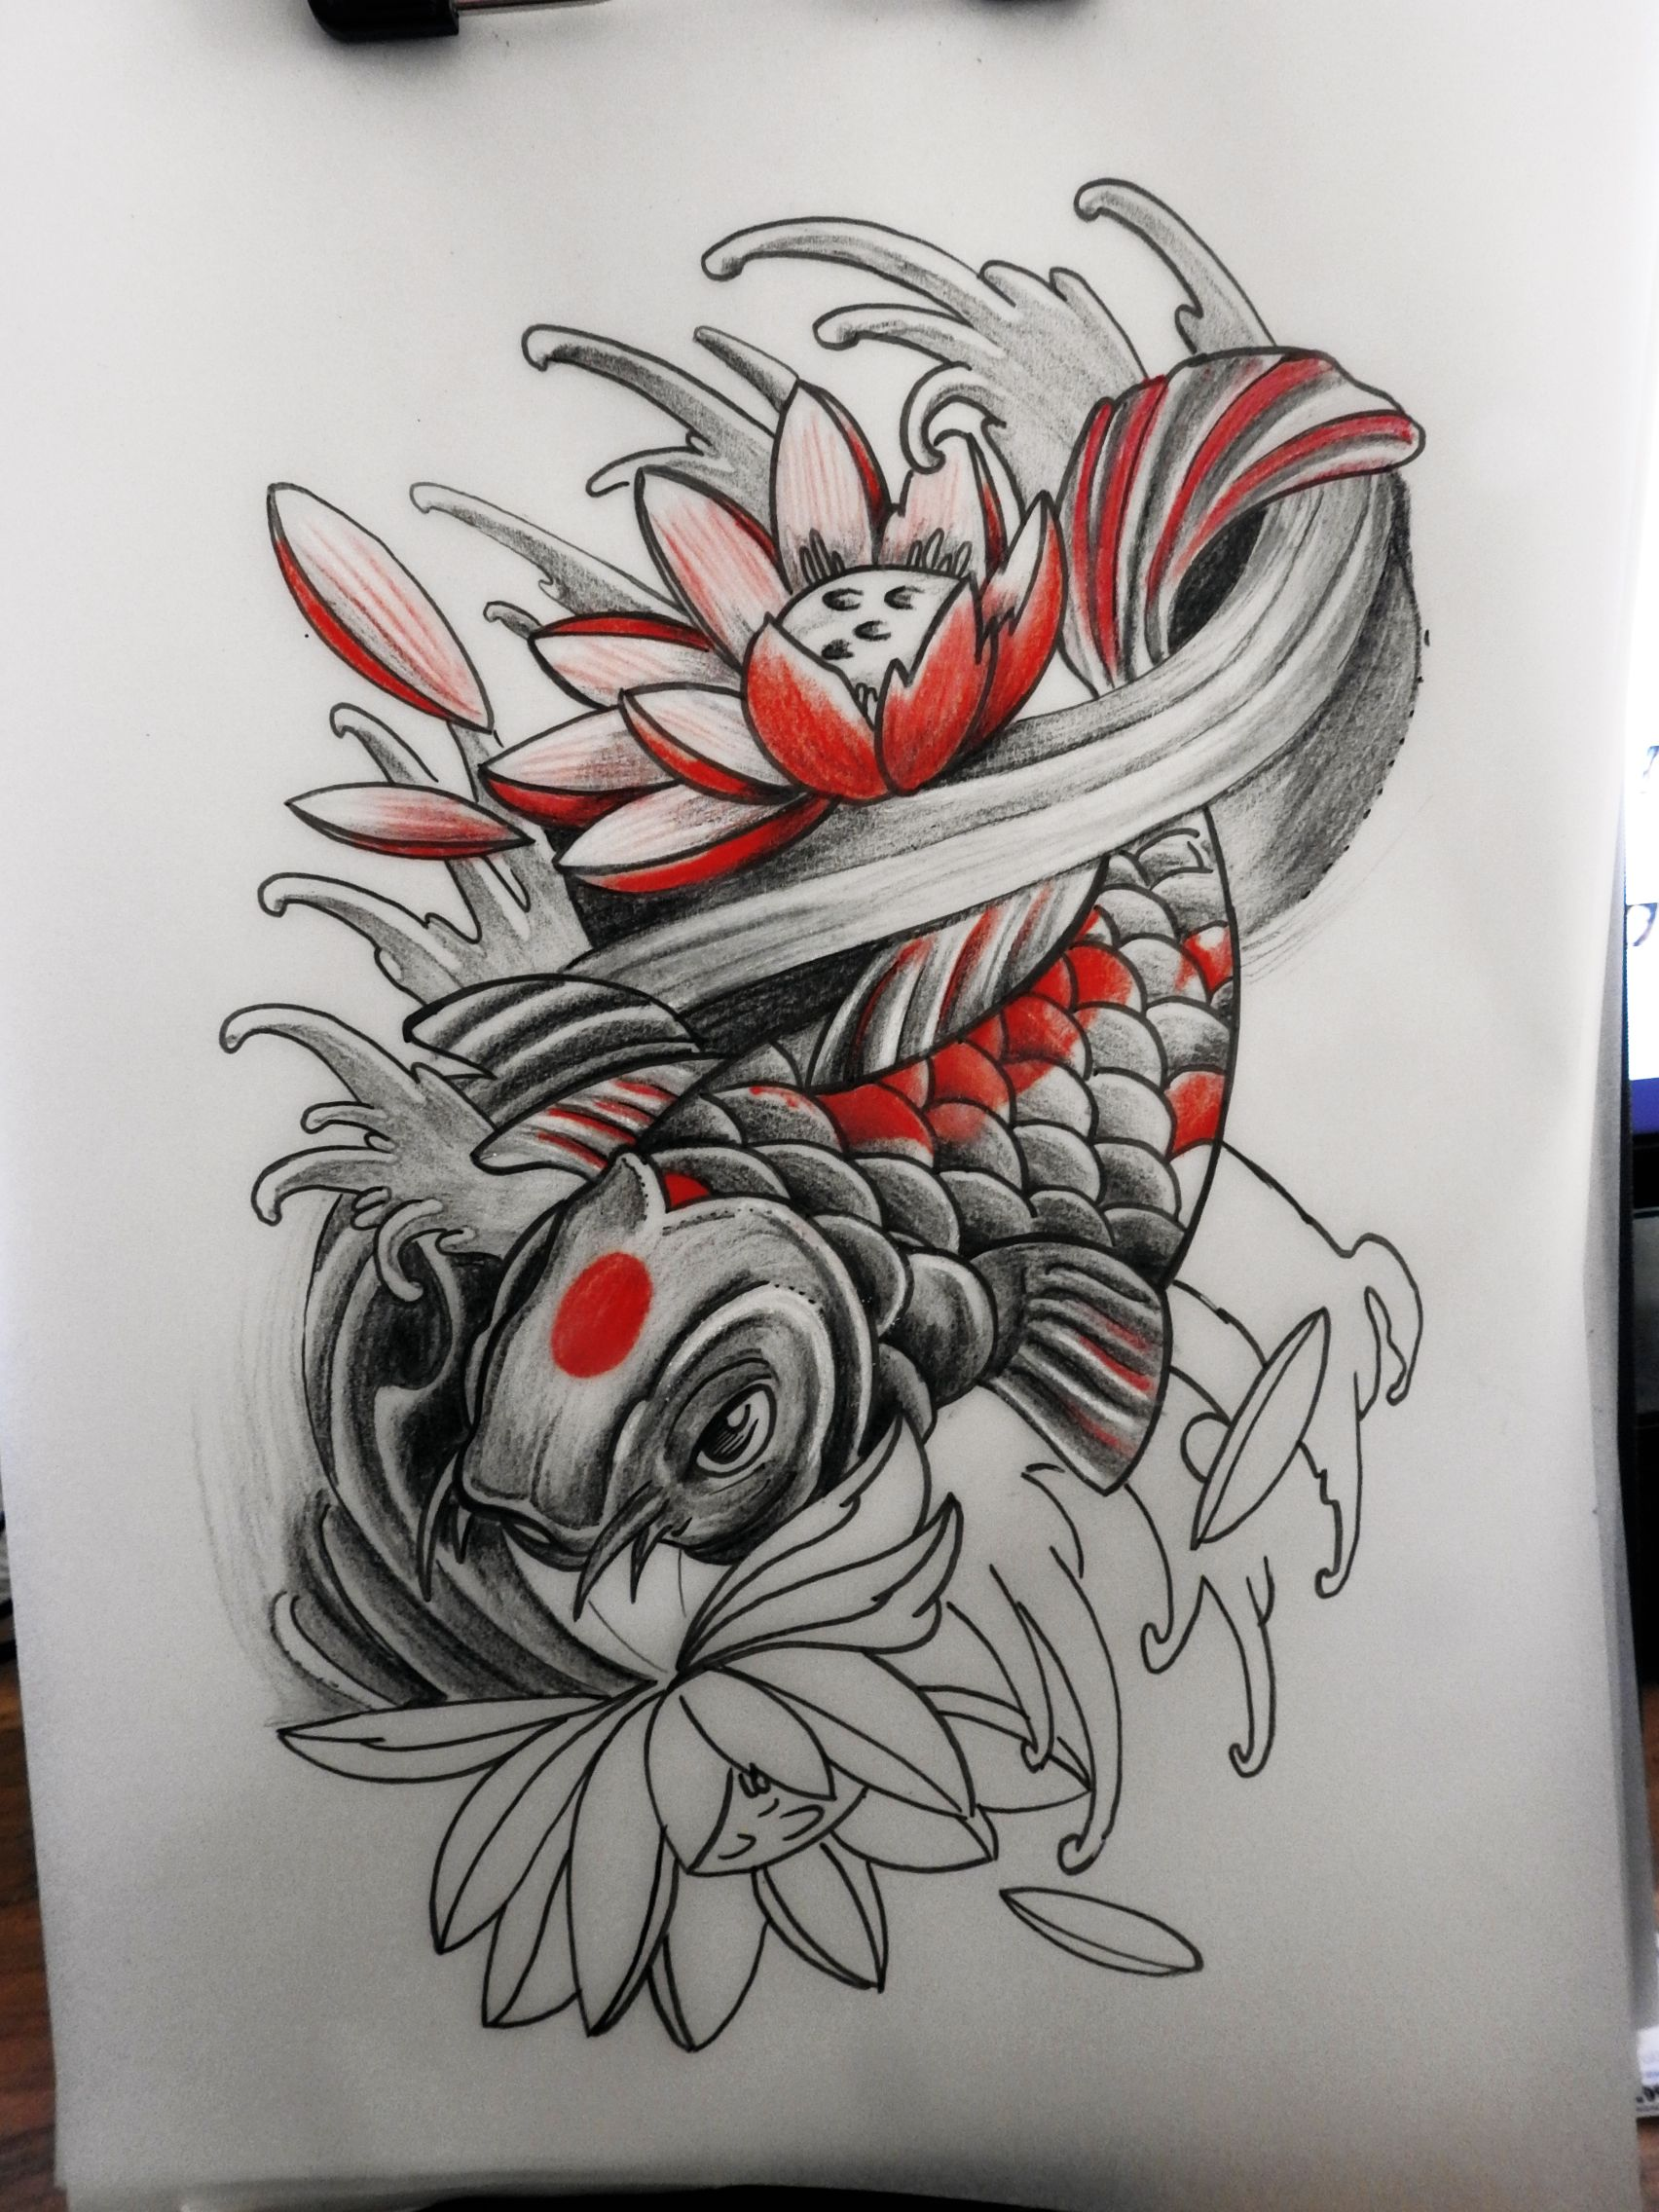 tattoo art design custom drawing pencil vorlage entwurf asia koi water lotus